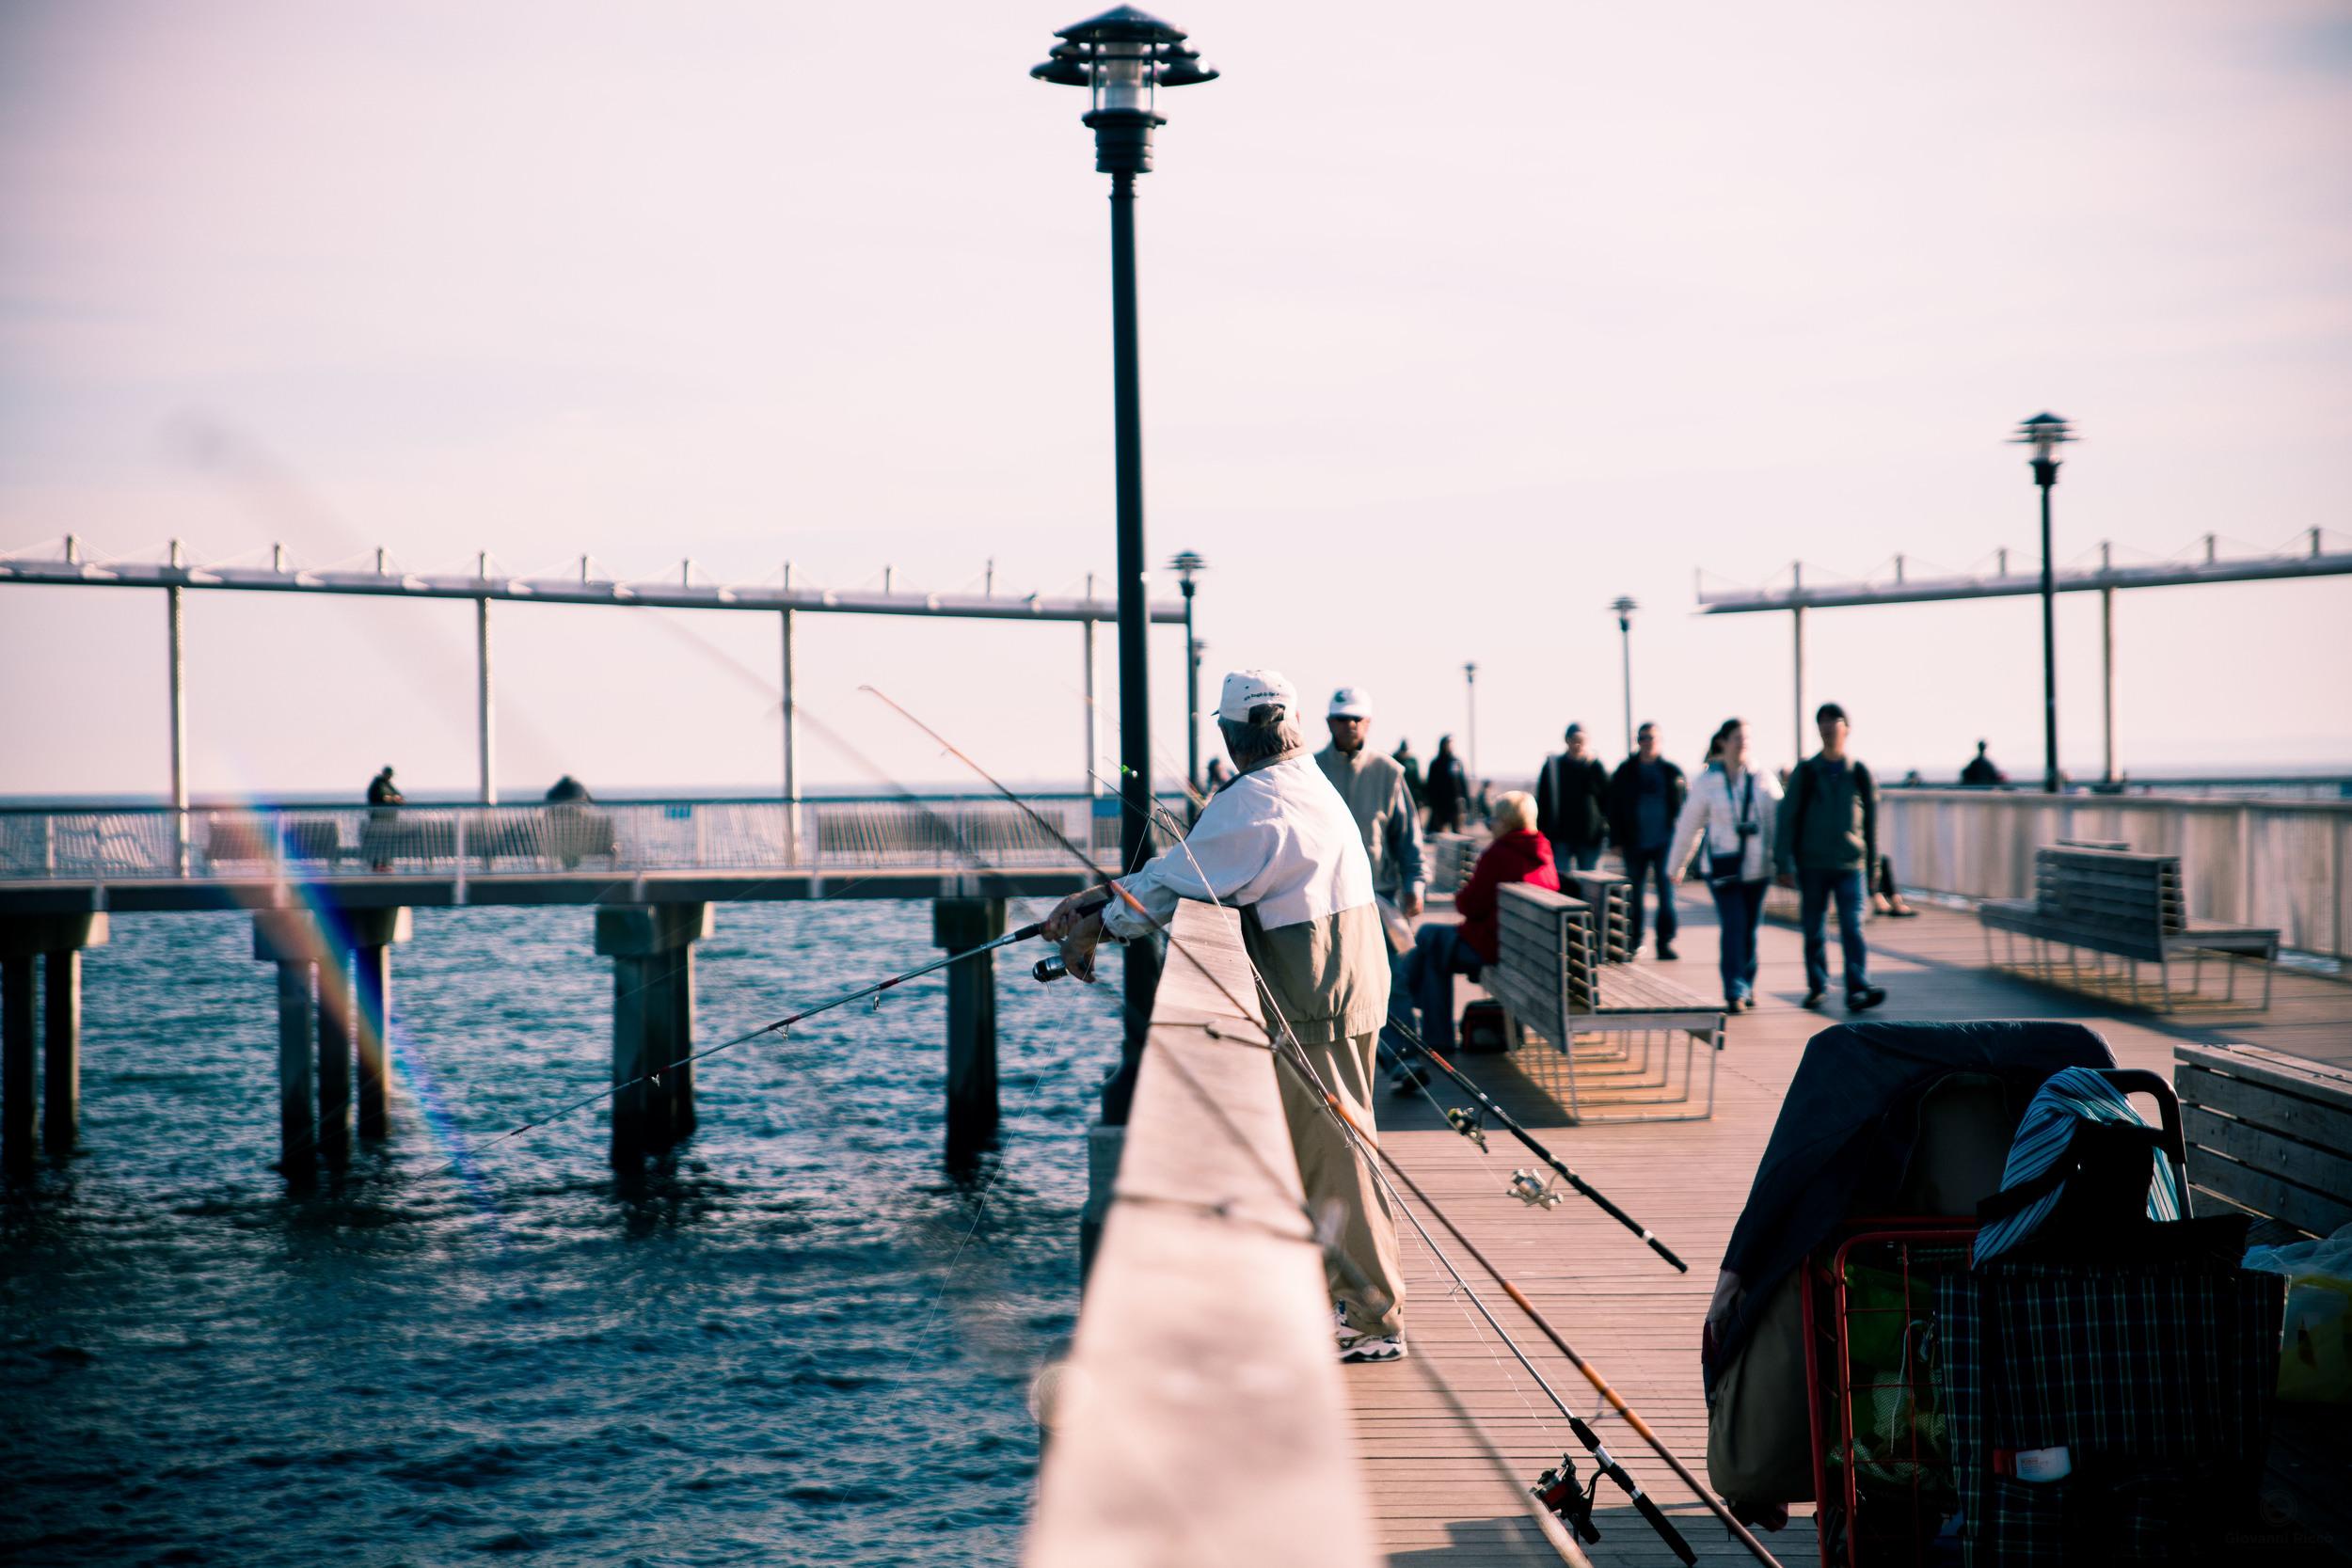 Fishermen in NYC